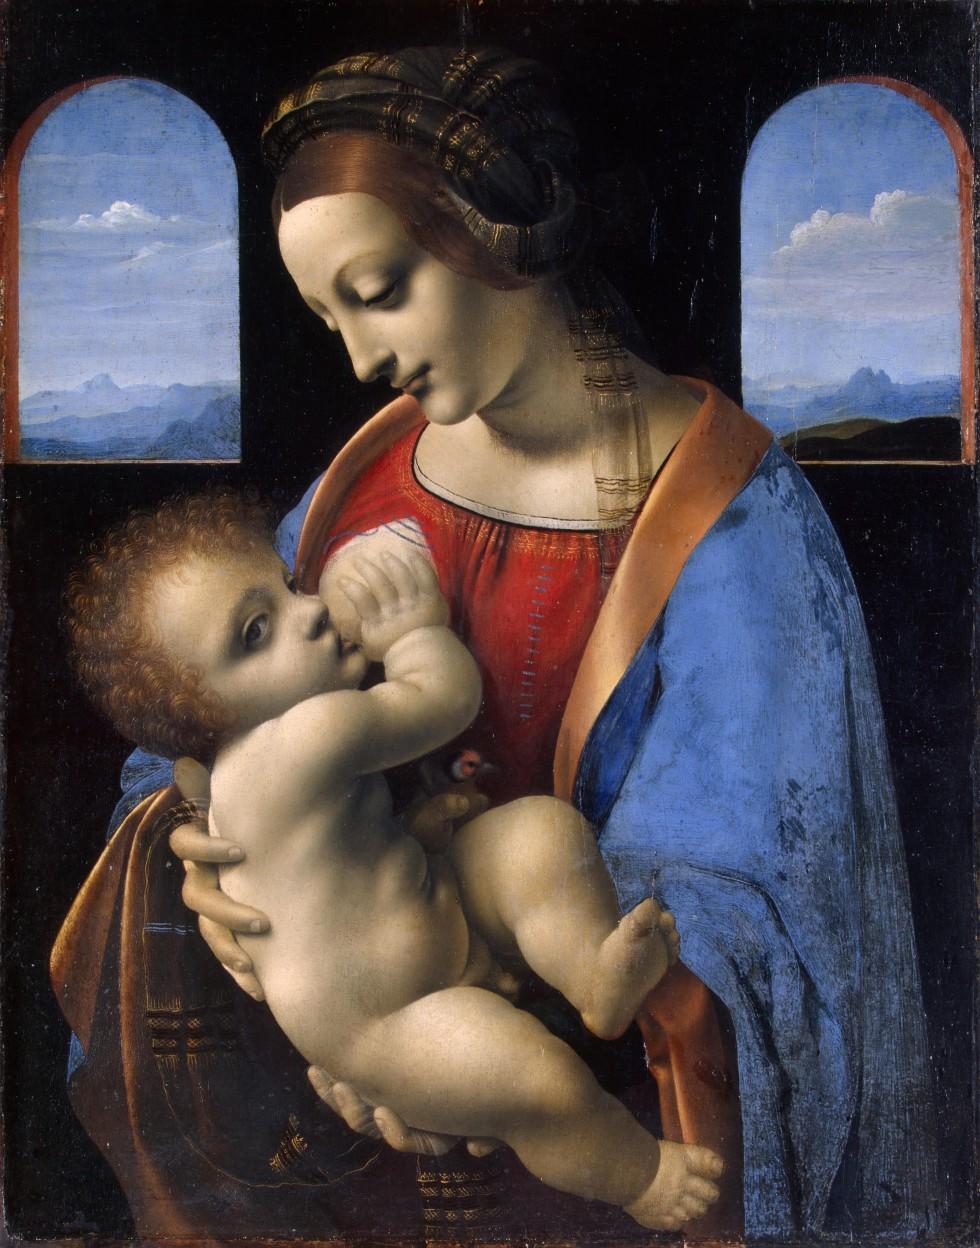 Леонардо да Винчи. Мадонна Литта.1490–1491. Фото: hermitagemuseum.org